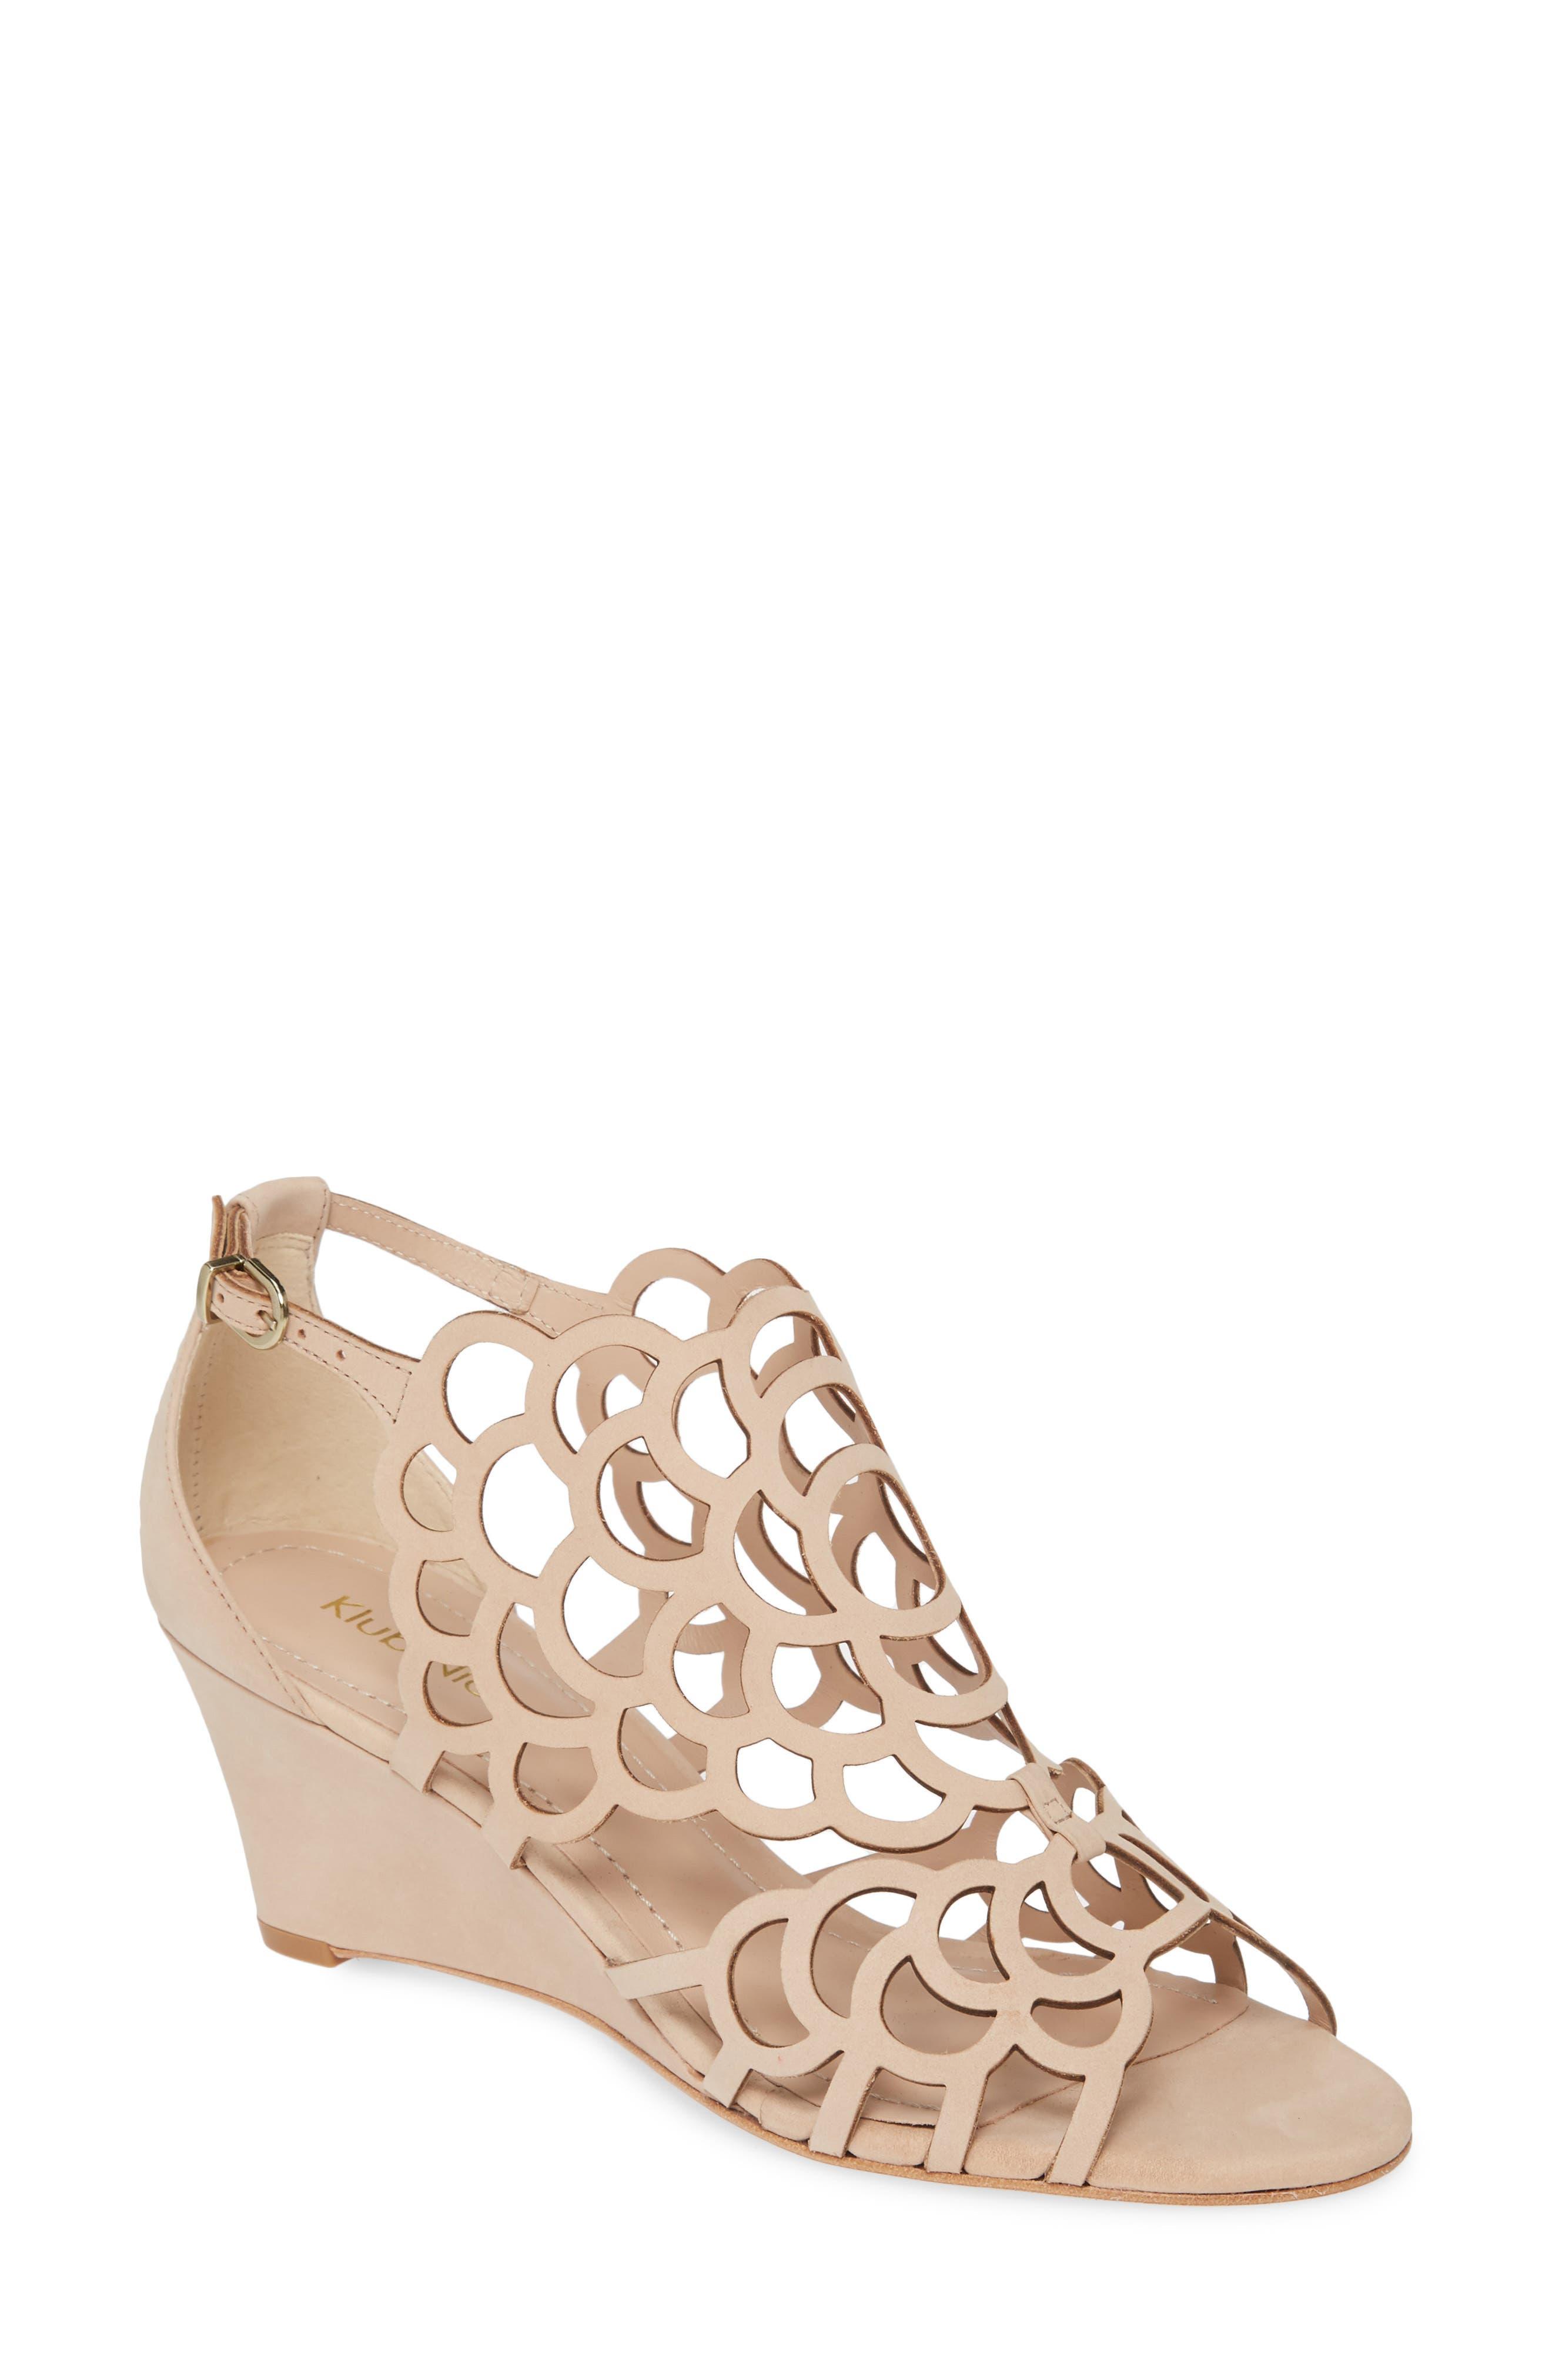 Millie Cutout Wedge Sandal